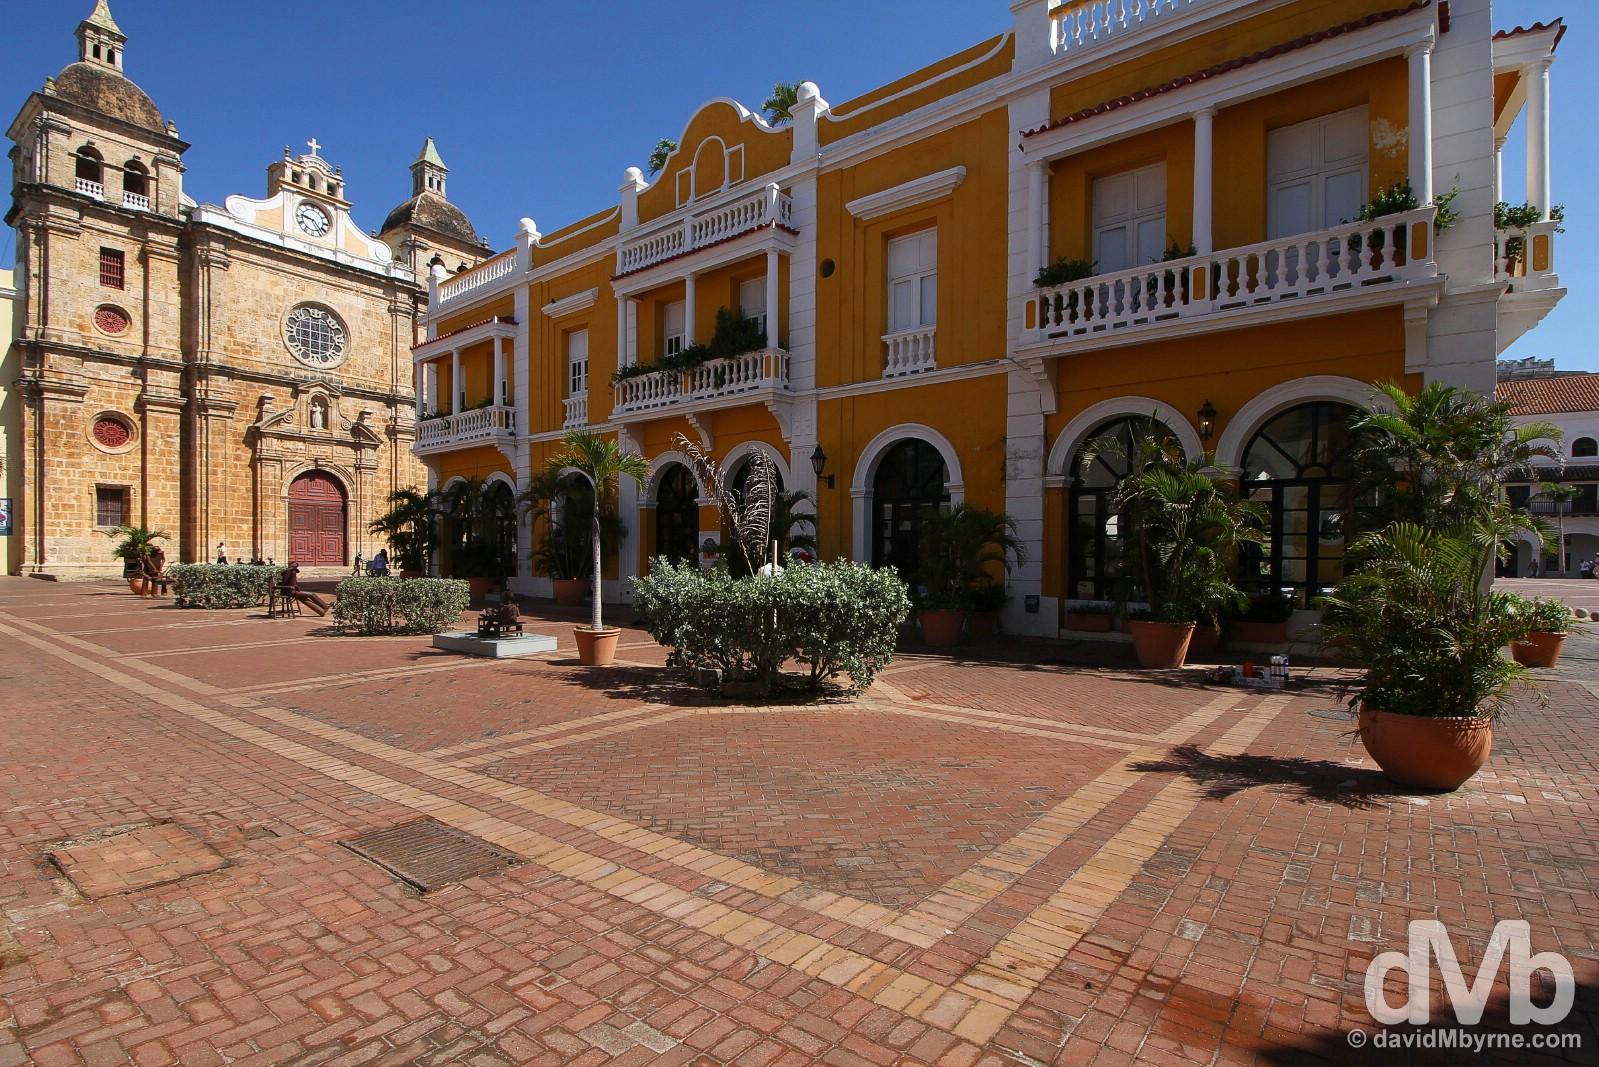 Colonial buildings, including the facade of Iglesia de San Pedro Claver, as seen from the corner of Plaza de la Aduana in Old Town Cartagena, Colombia. June 25, 2015.